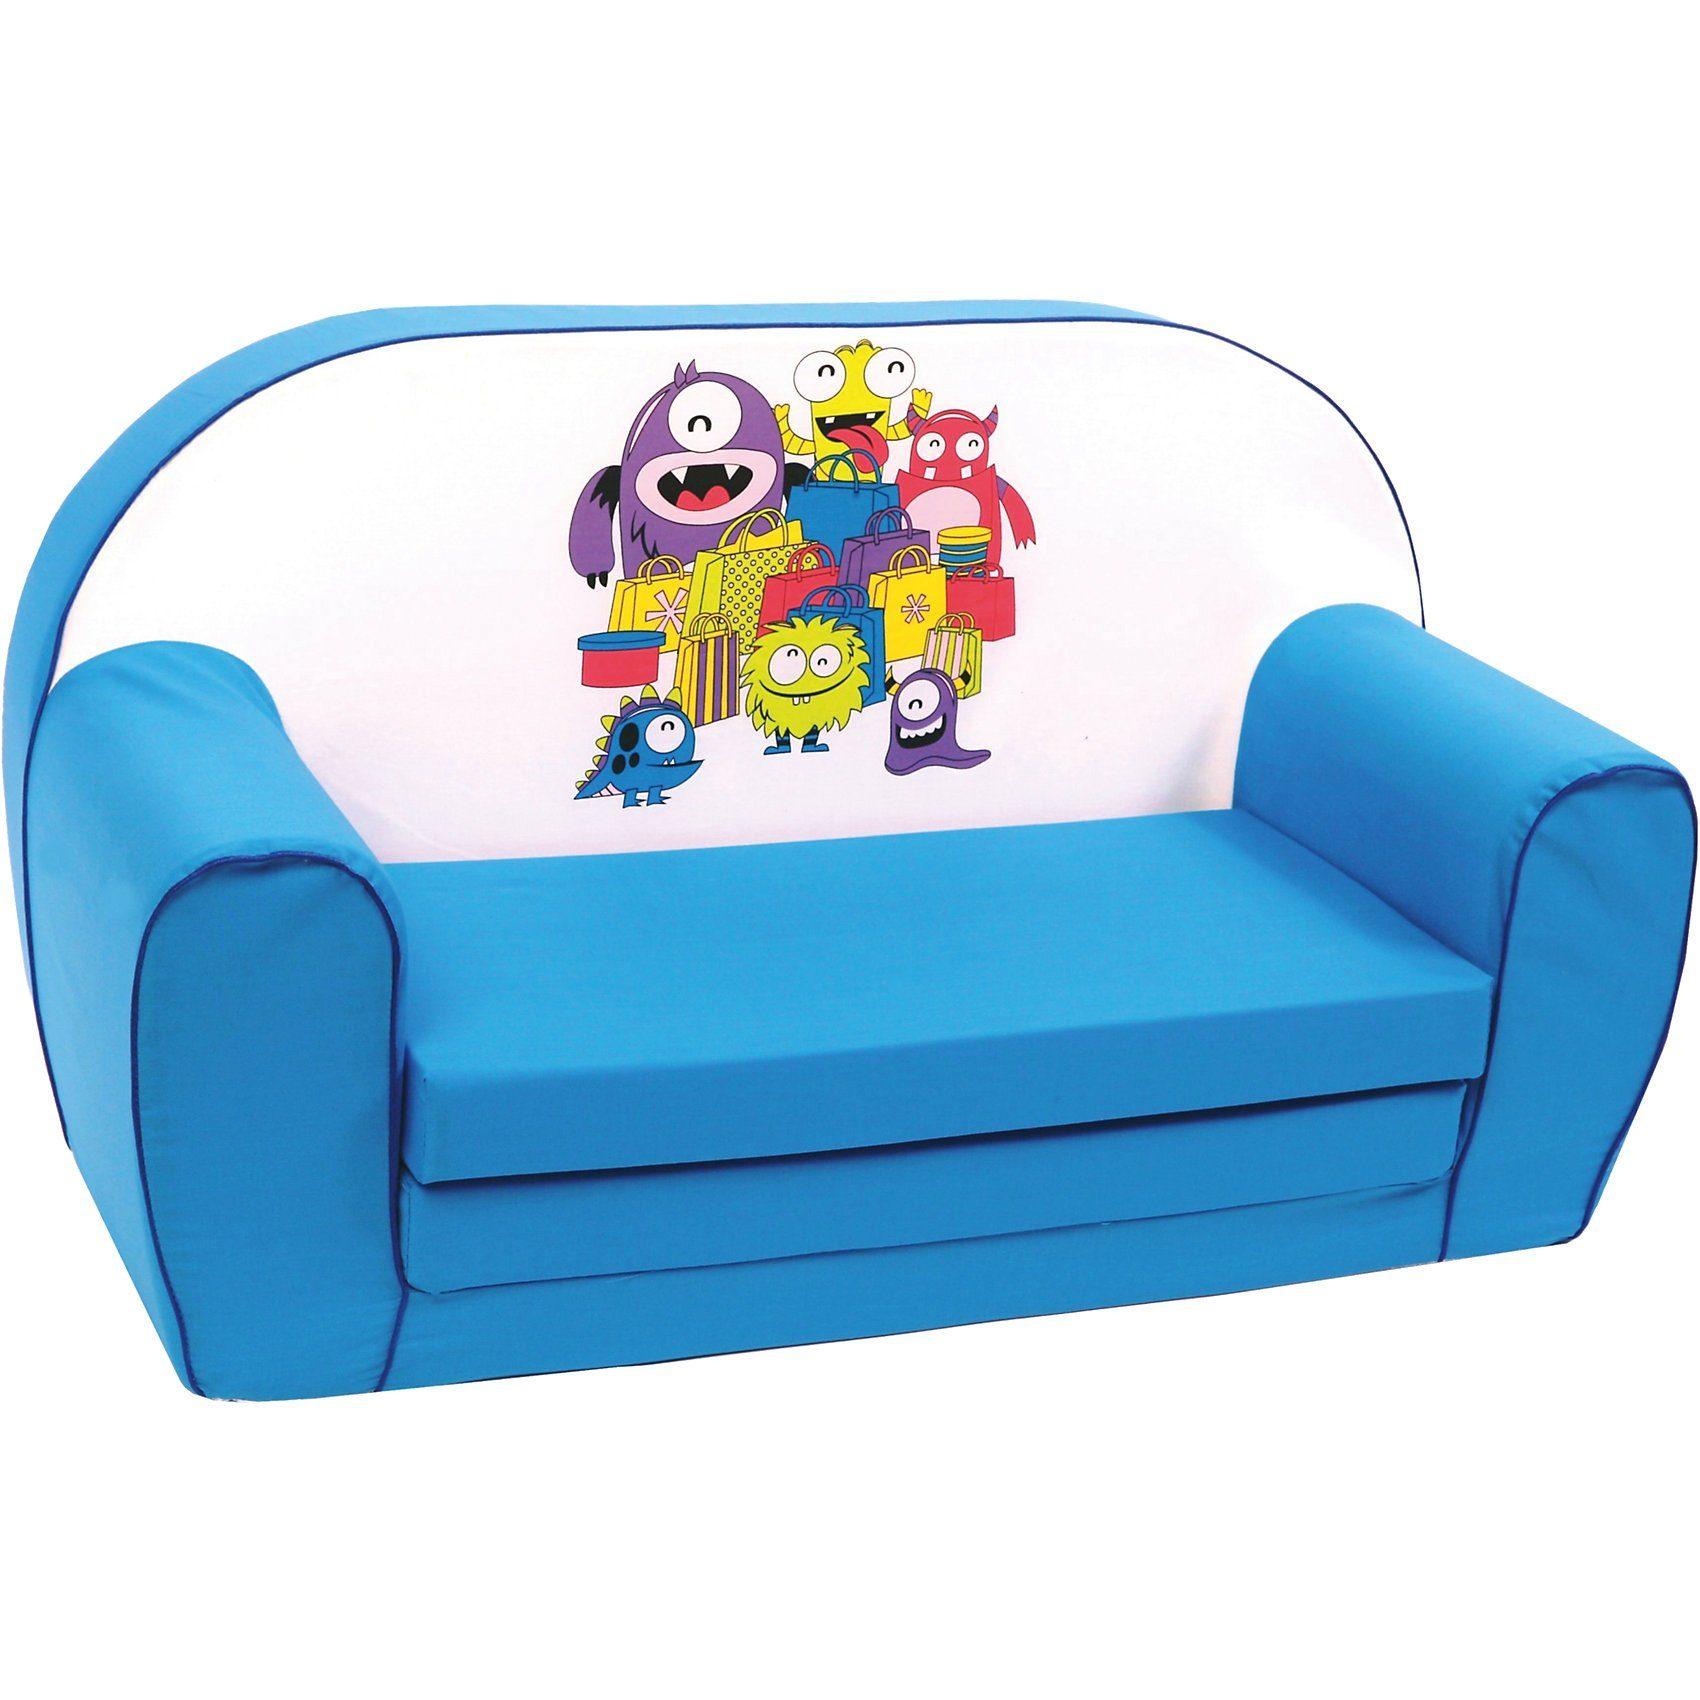 Knorrbaby Mini-Schlafsofa Monster, blau